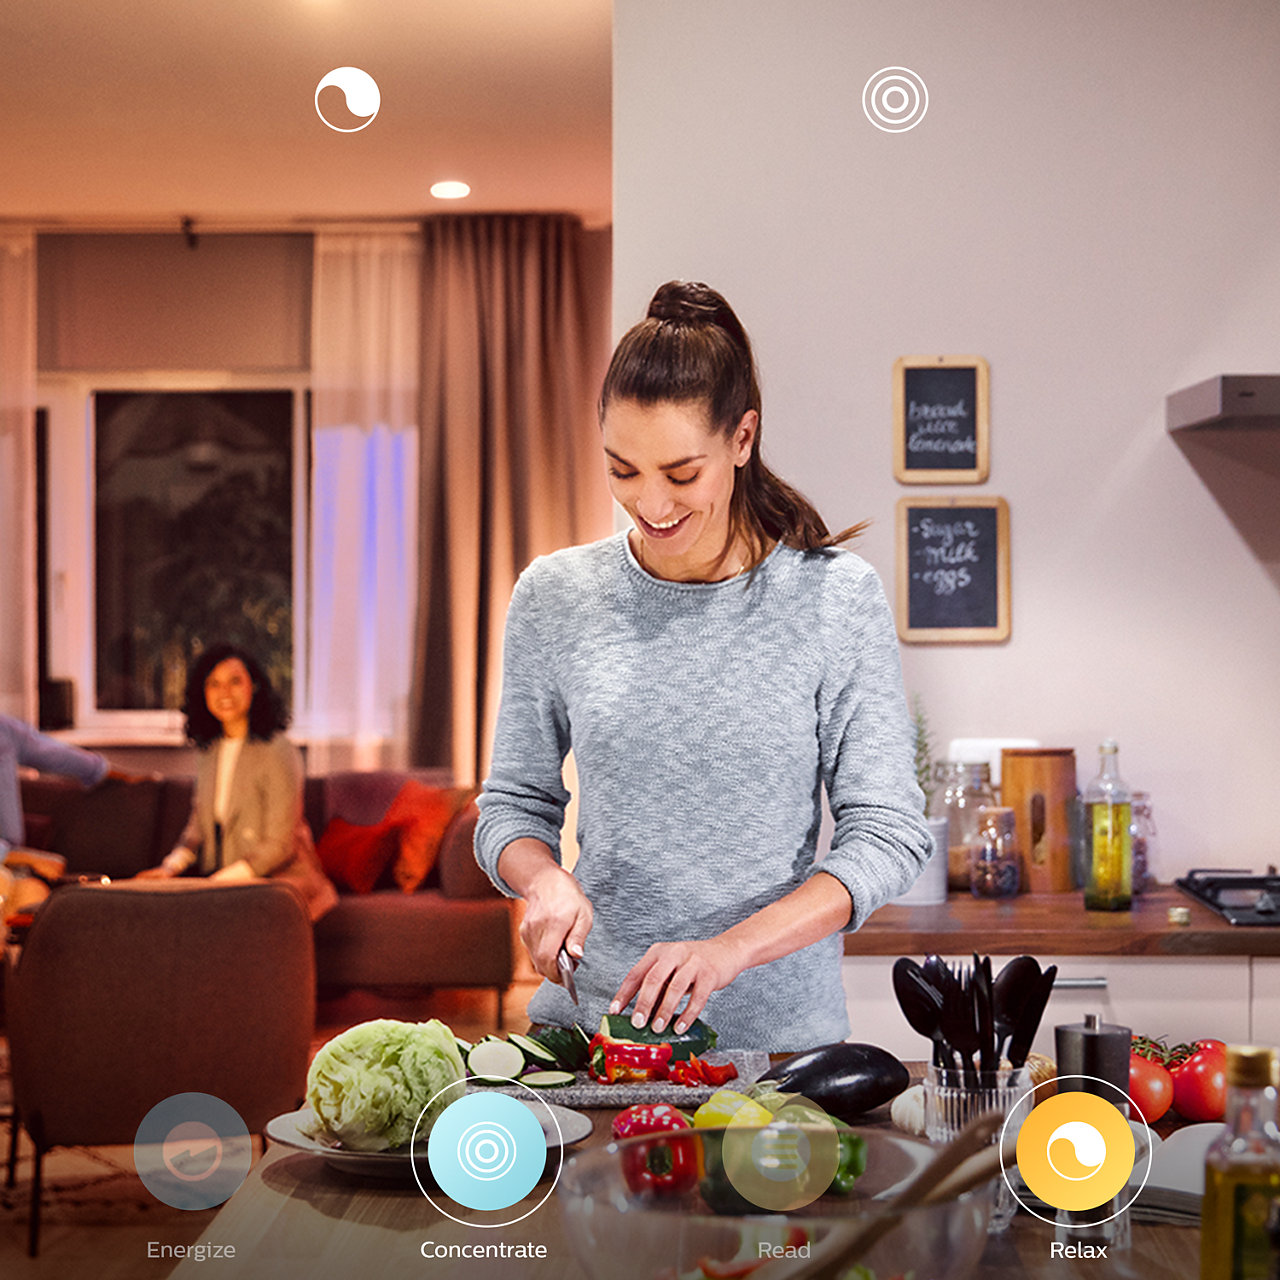 Philips hue เลือกแสงที่ต้องการ ตามใจคุณ